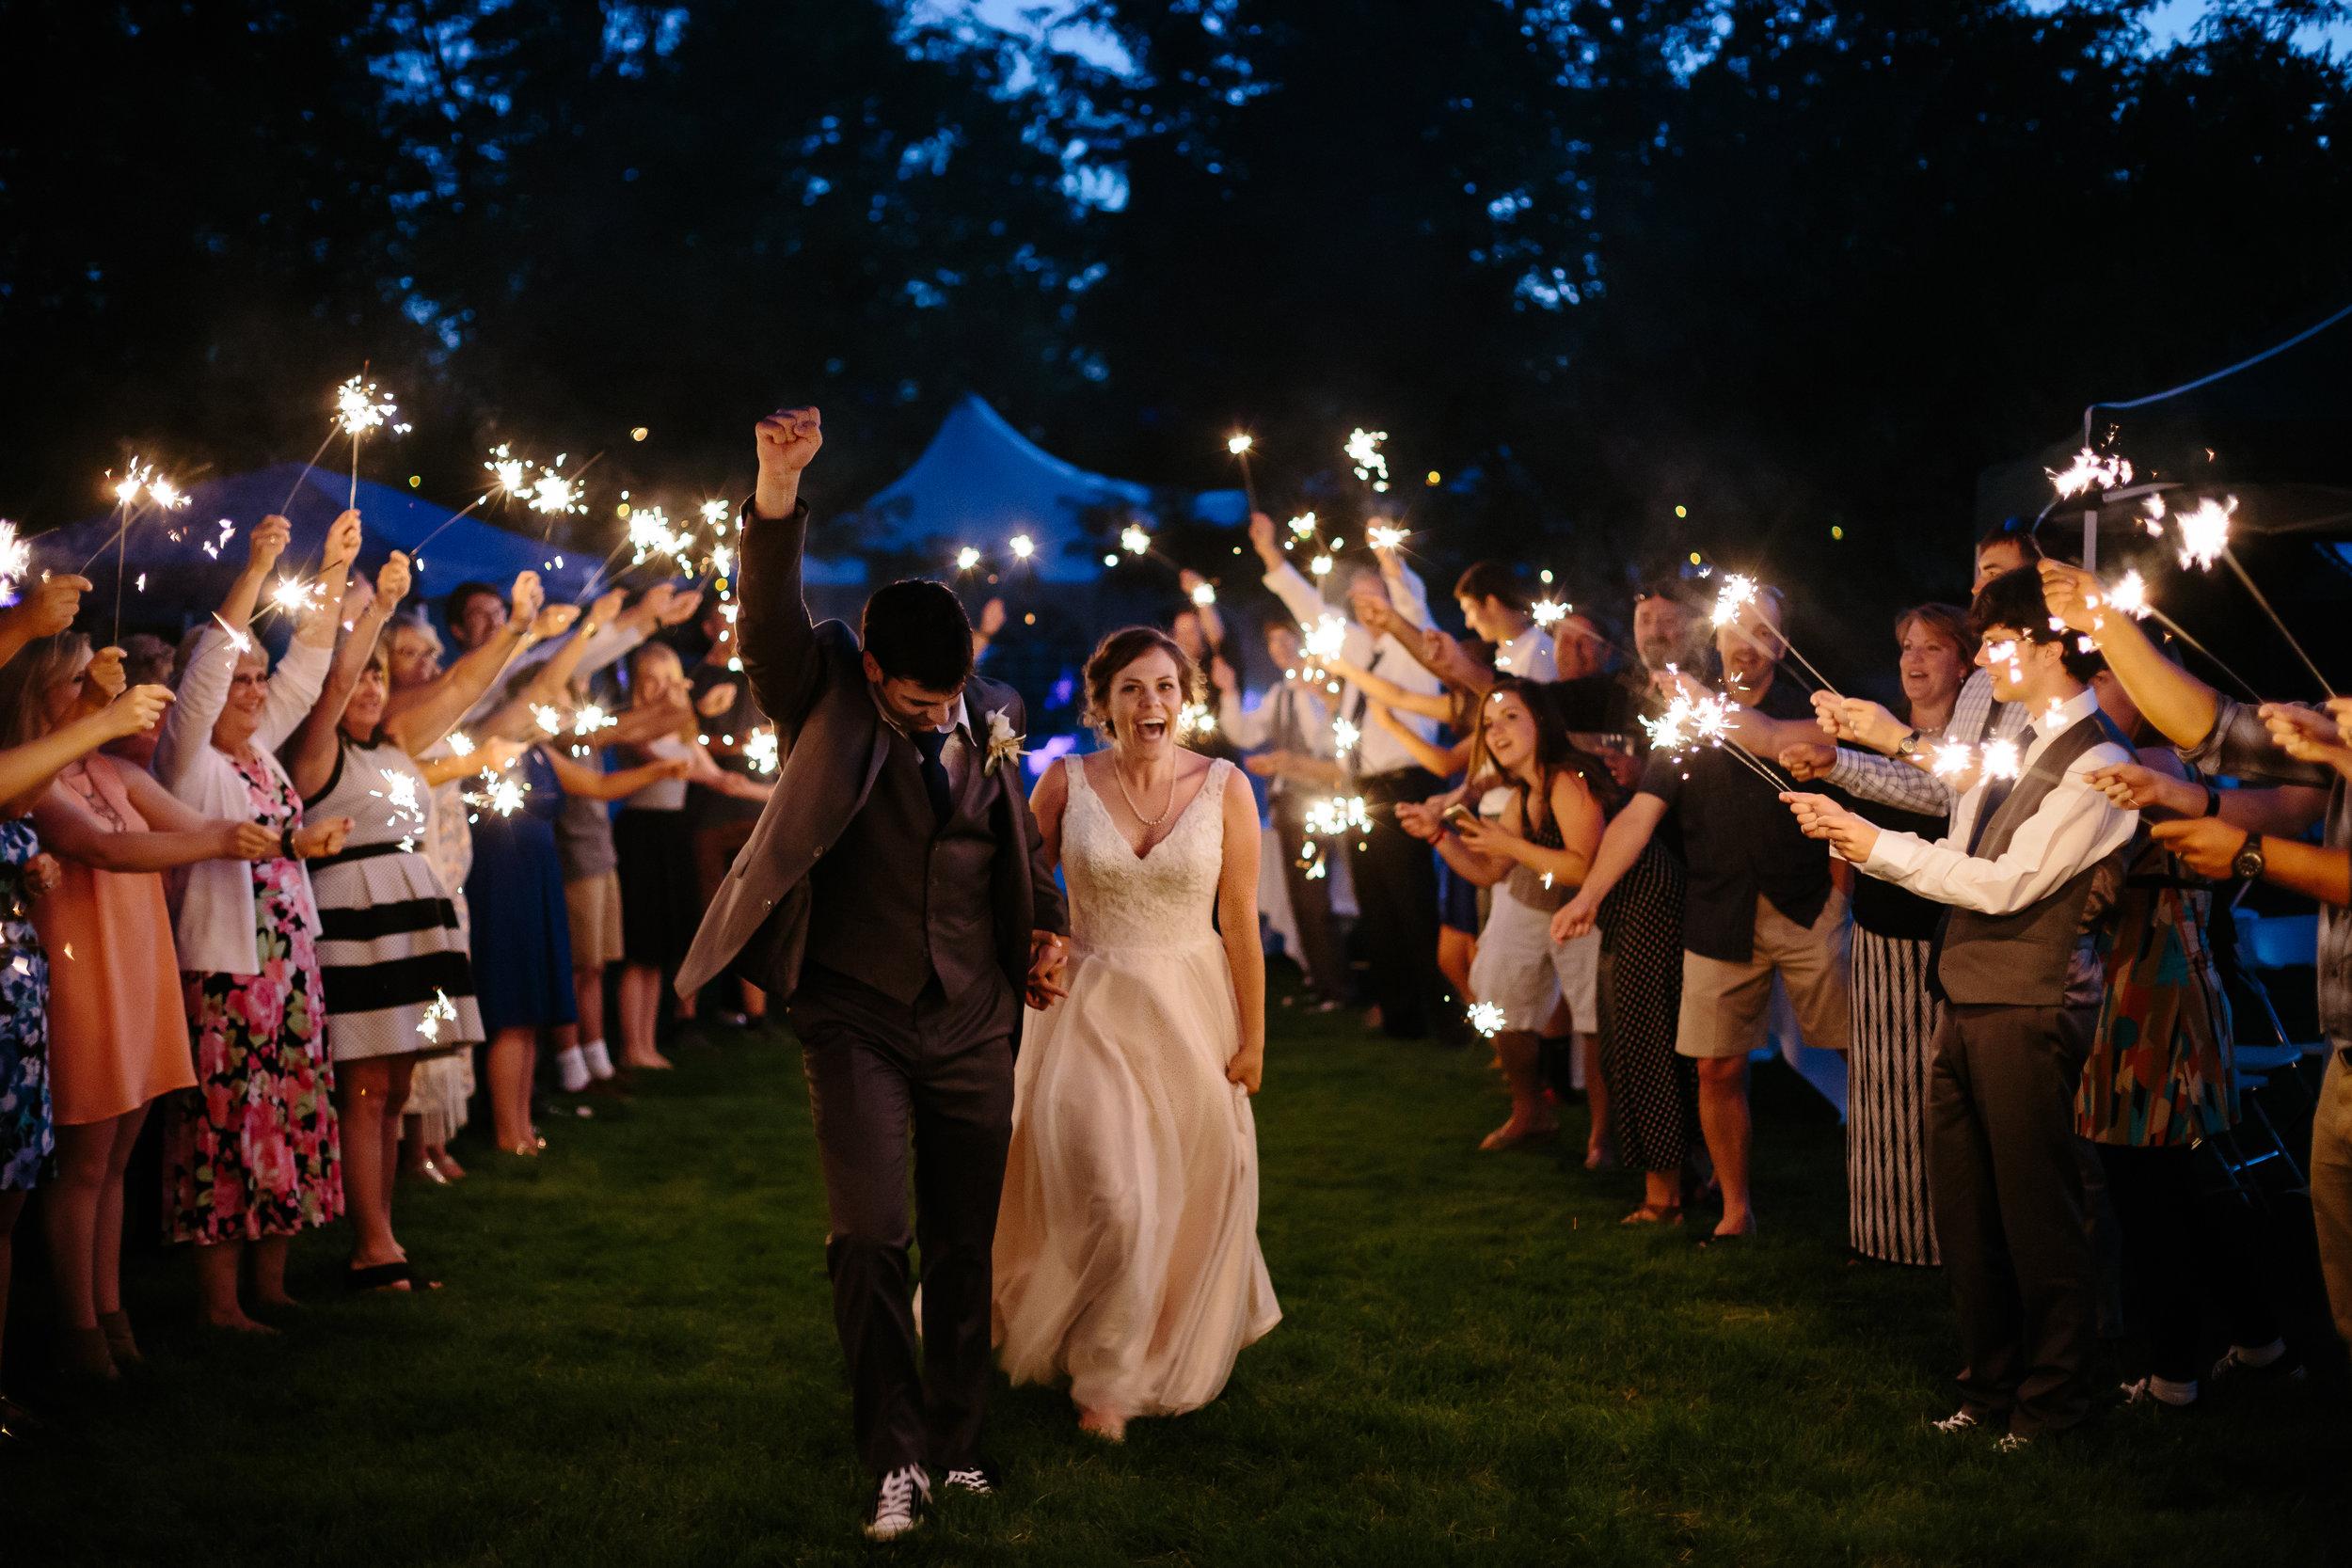 Jordan & Shantel Married - Idaho - Corrie Mick Photography-388.jpg